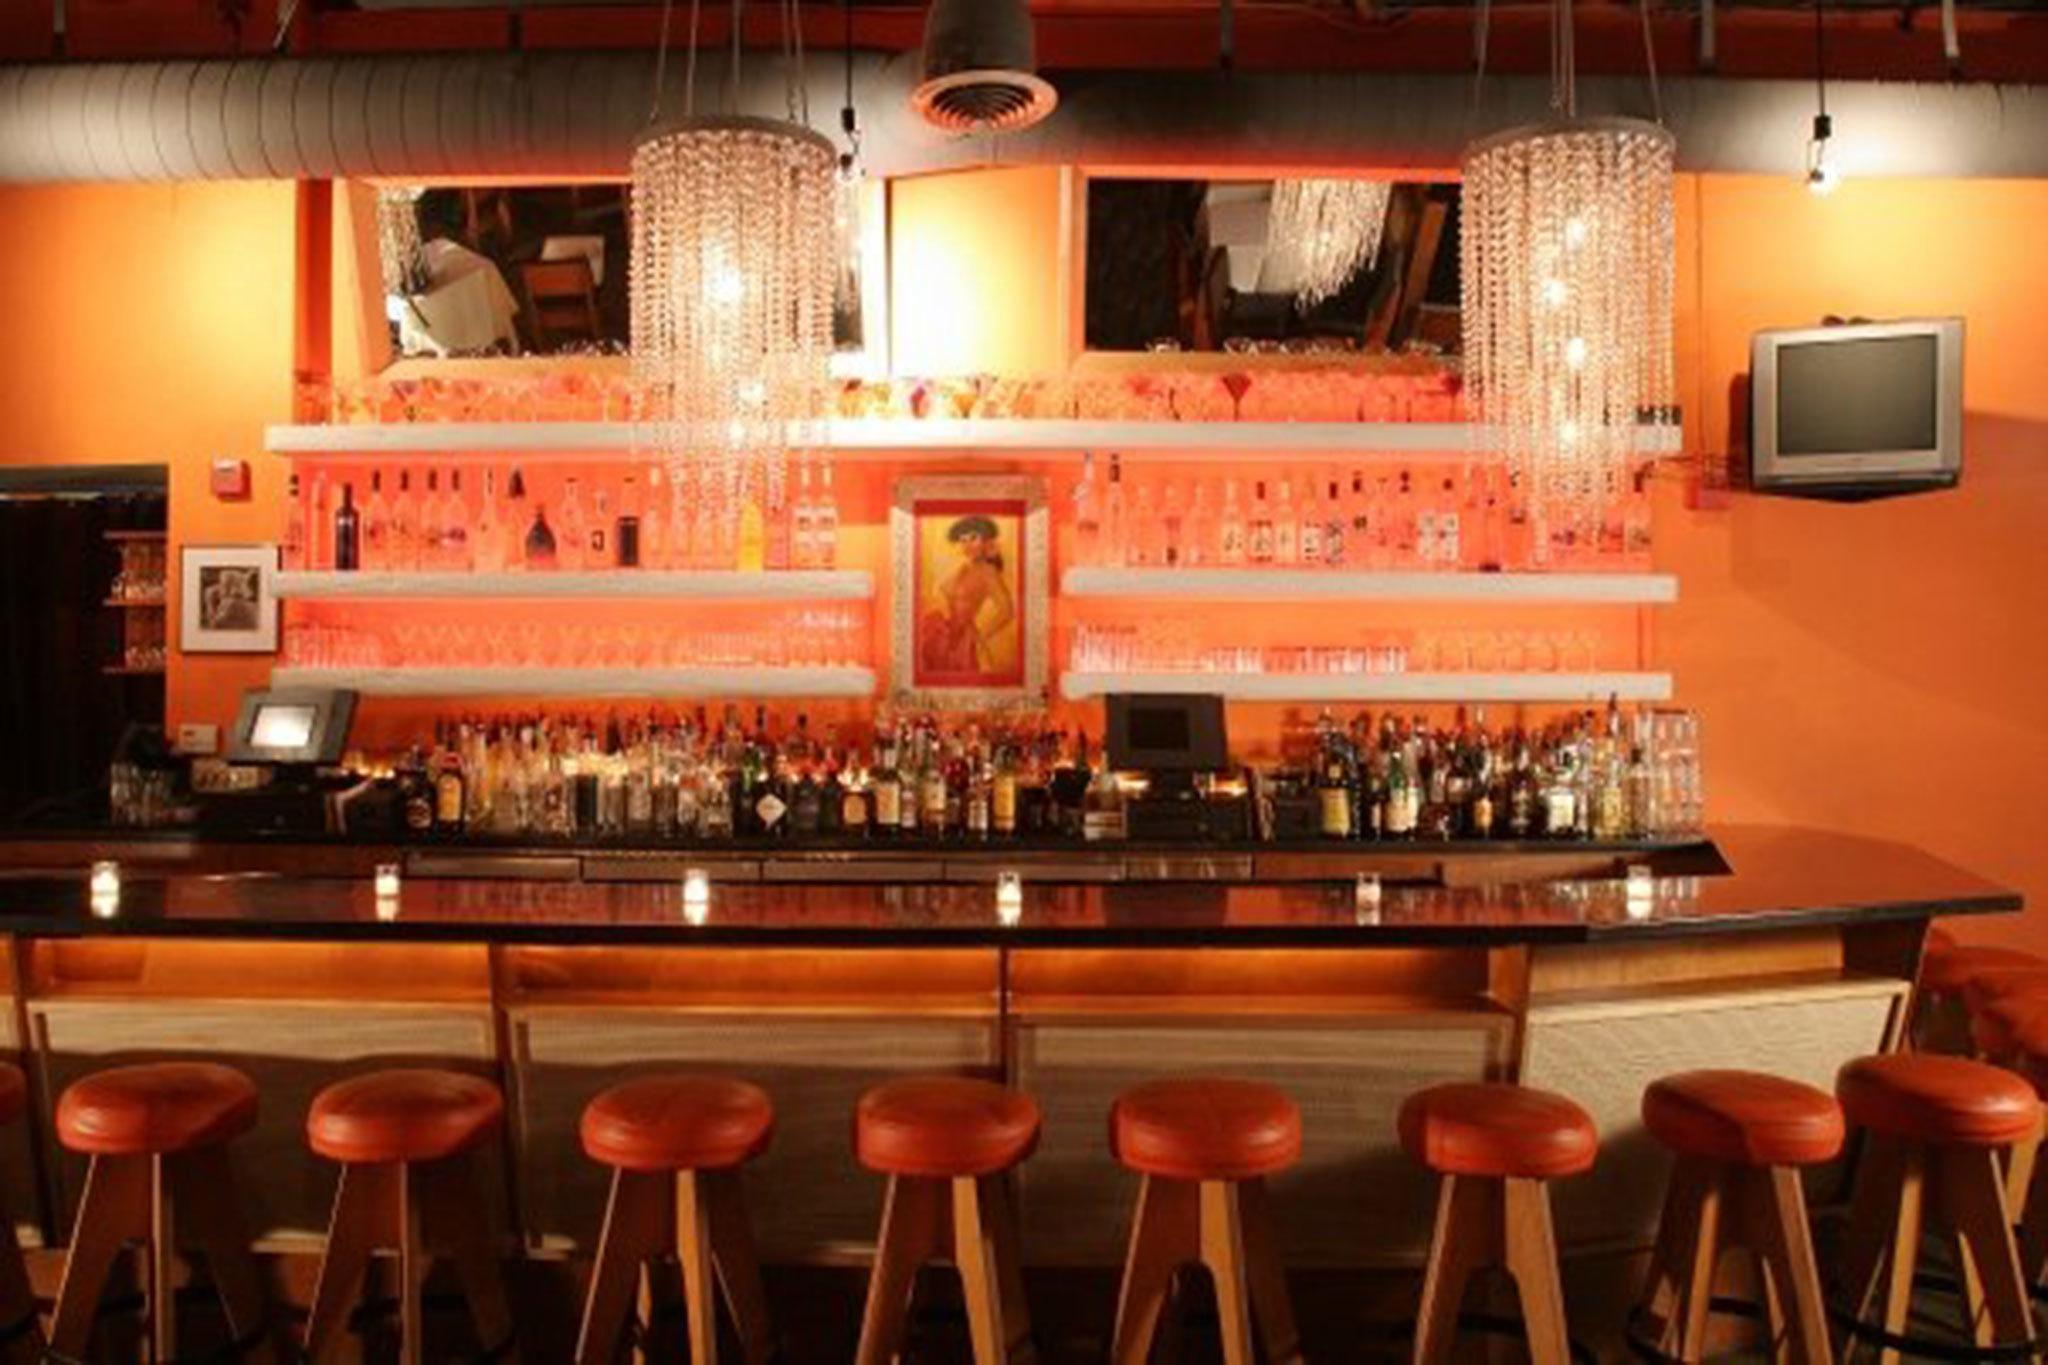 Whipitgood Mr. Pineapple Martini at Nic's Beverly Hills